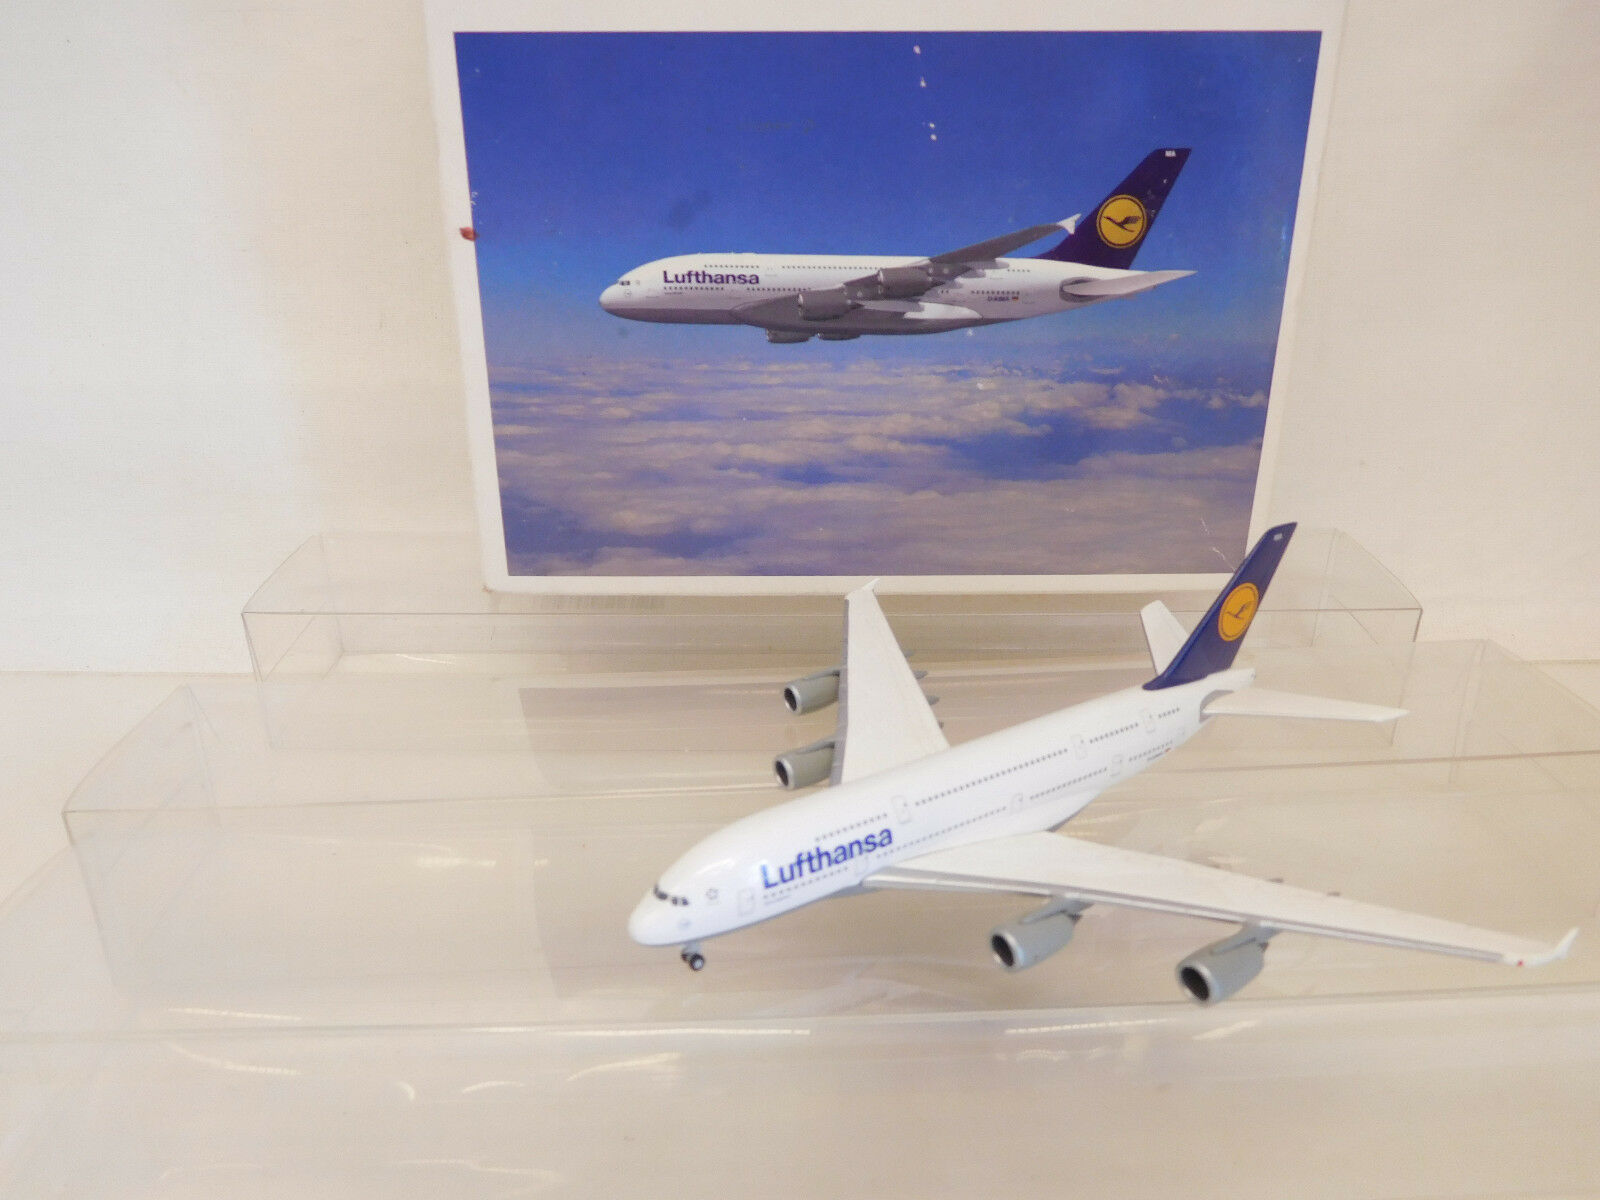 Mes-58817 Herpa Airbus a380-800 Lufthansa, 1/500, ottime condizioni